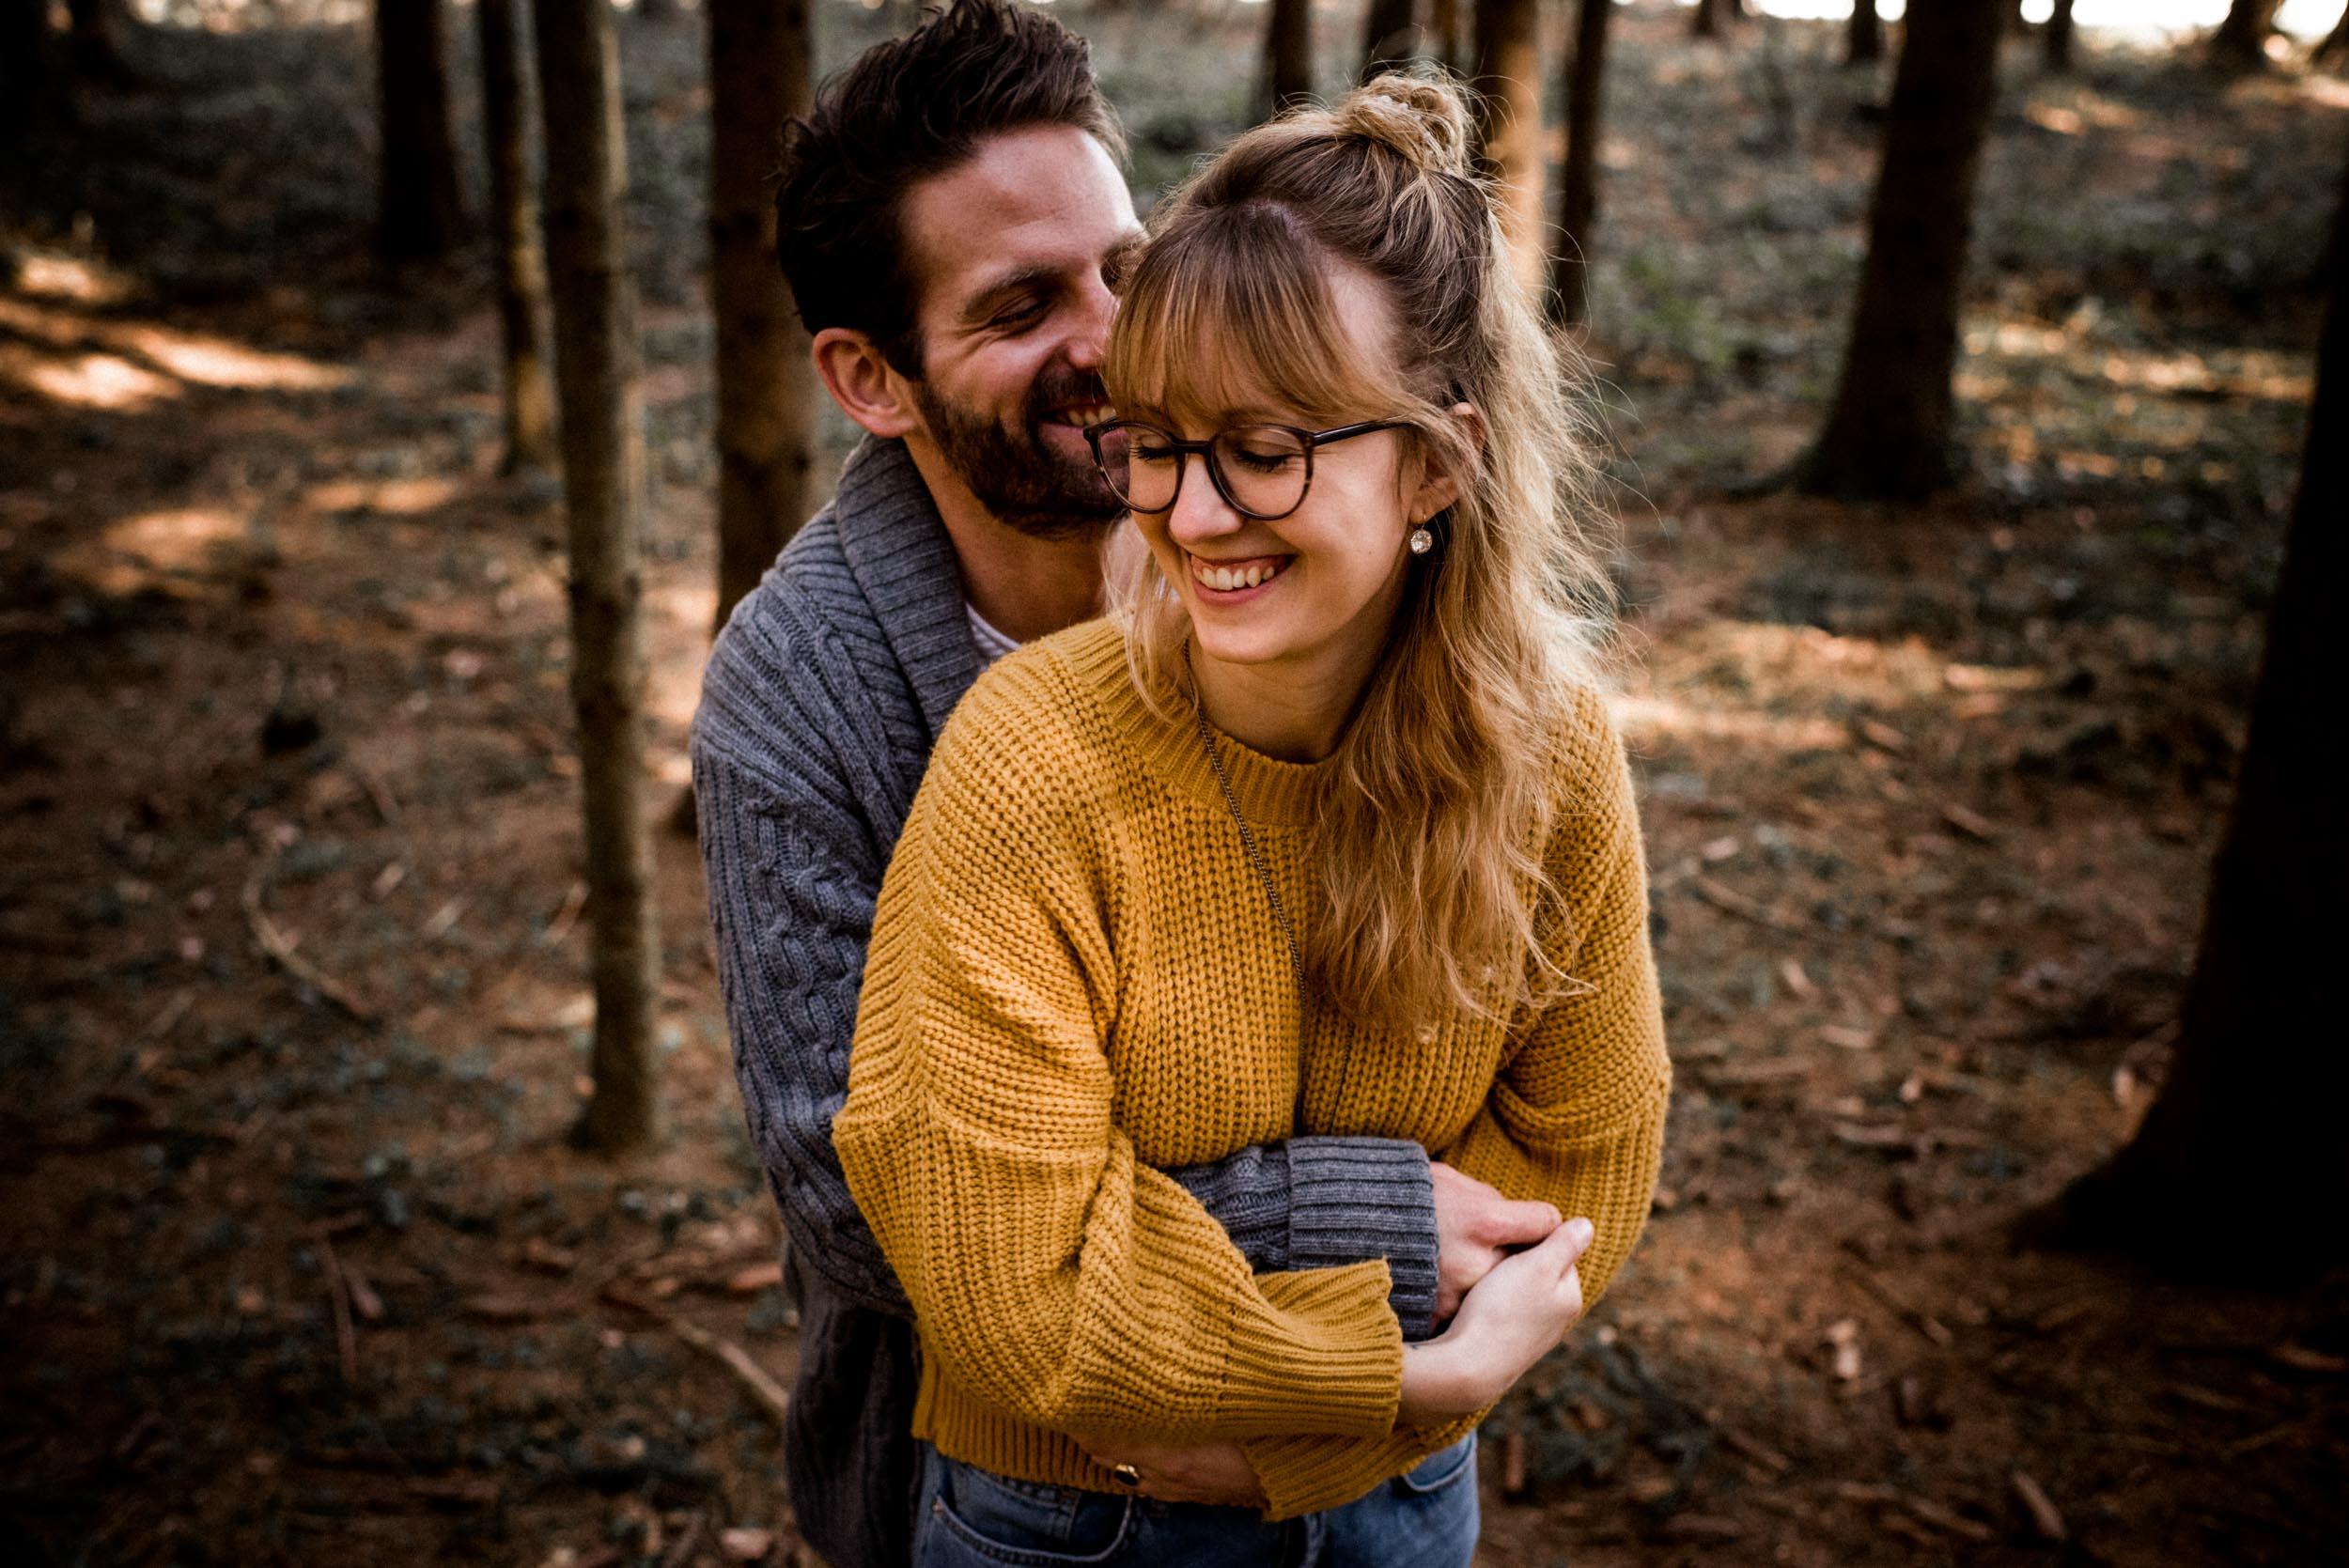 CoupleShooting-Authentic-21.jpg